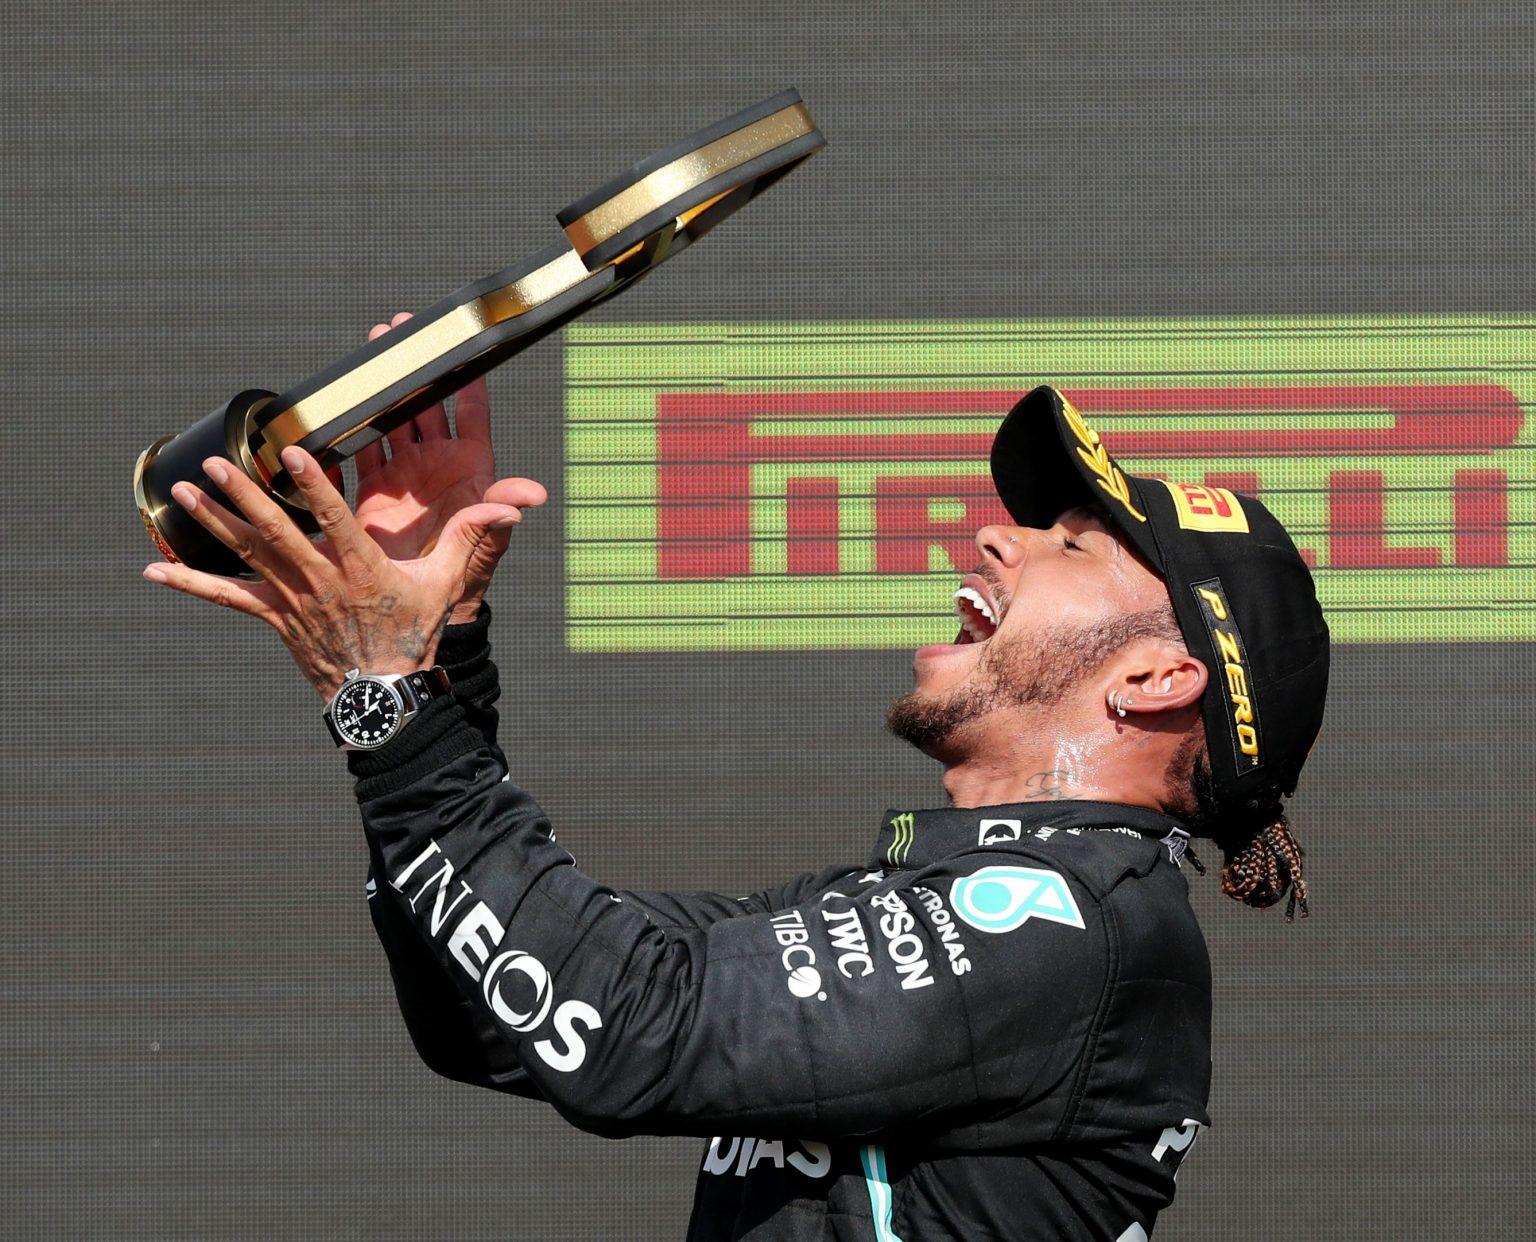 Lewis Hamilton wins British Grand Prix 2021  ലൂയിസ് ഹാമിൽട്ടൺ ബ്രിട്ടീഷ് ഗ്രാൻഡ് പ്രിക്സ് 2021 നേടി_40.1